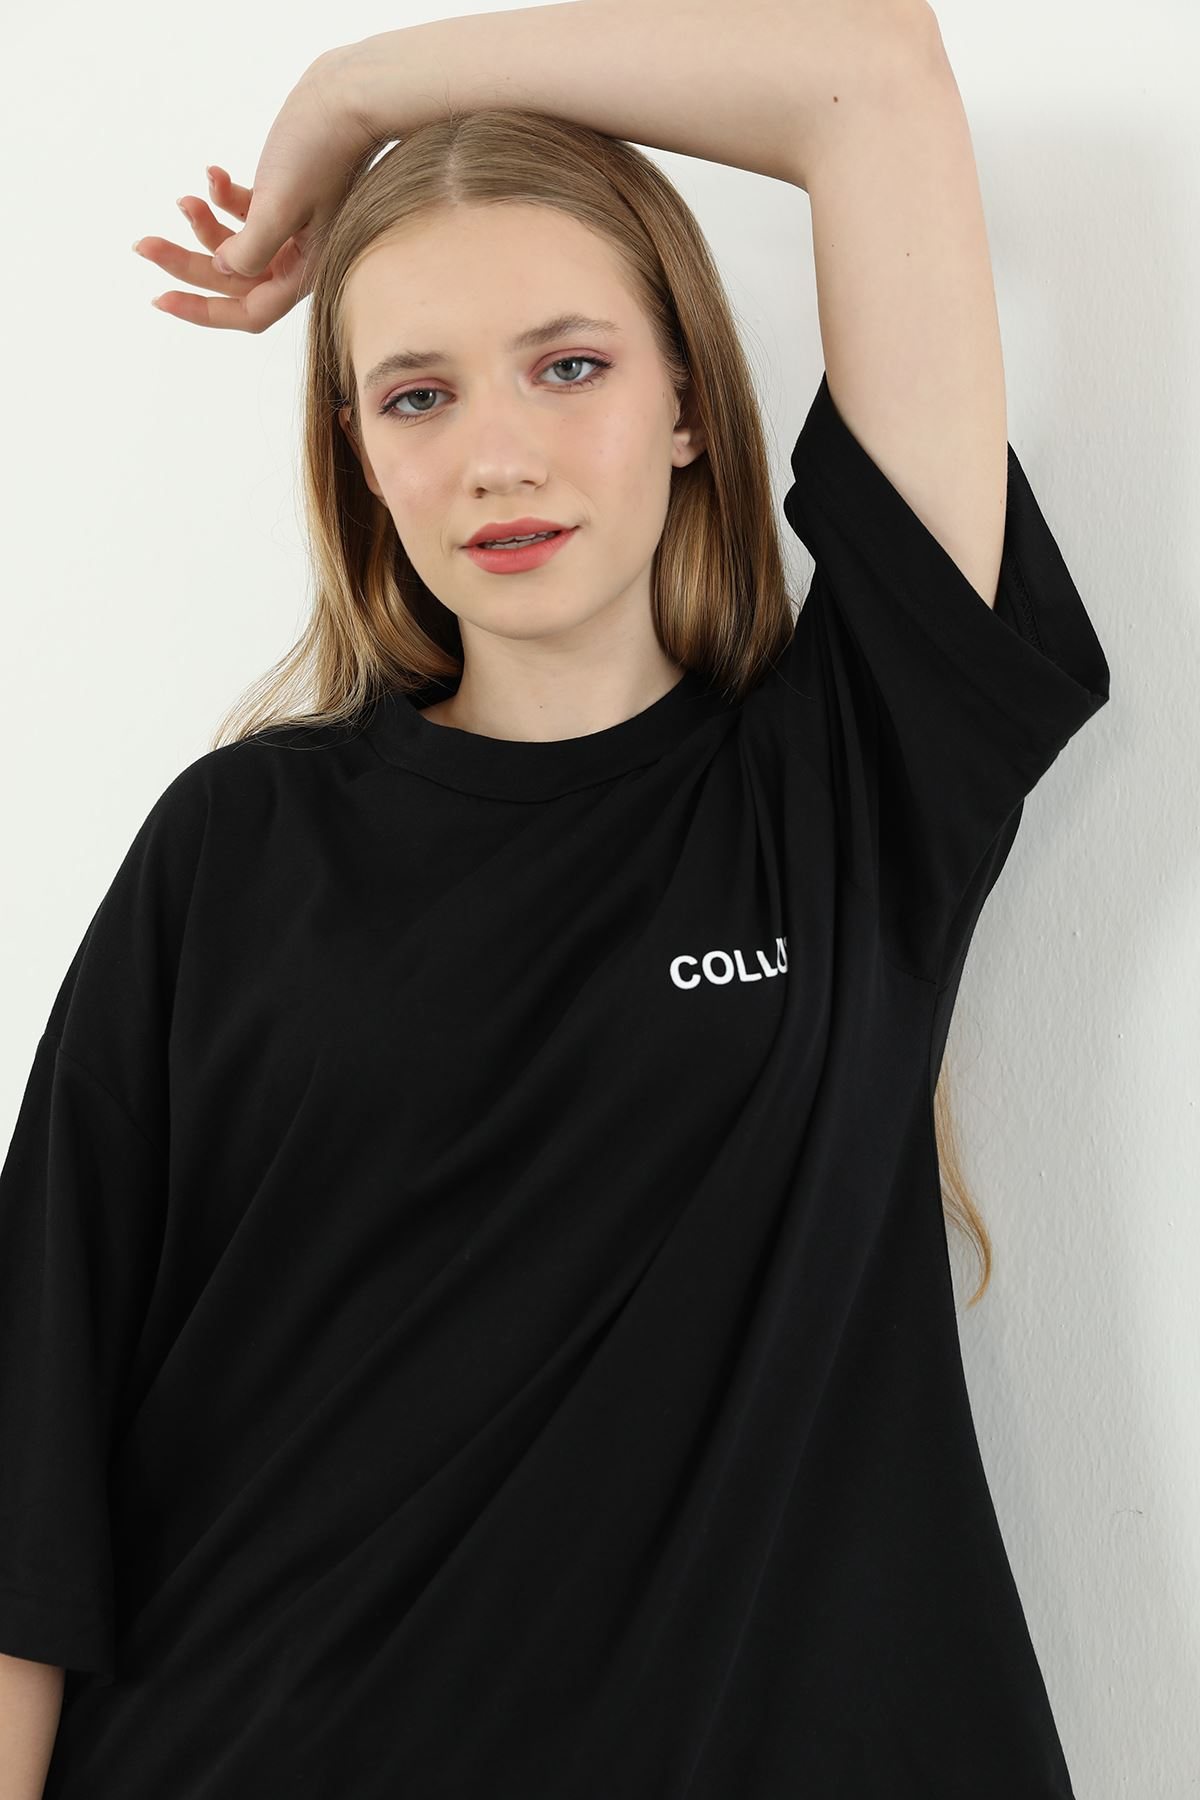 Collusıon Baskılı T-shirt-Siyah